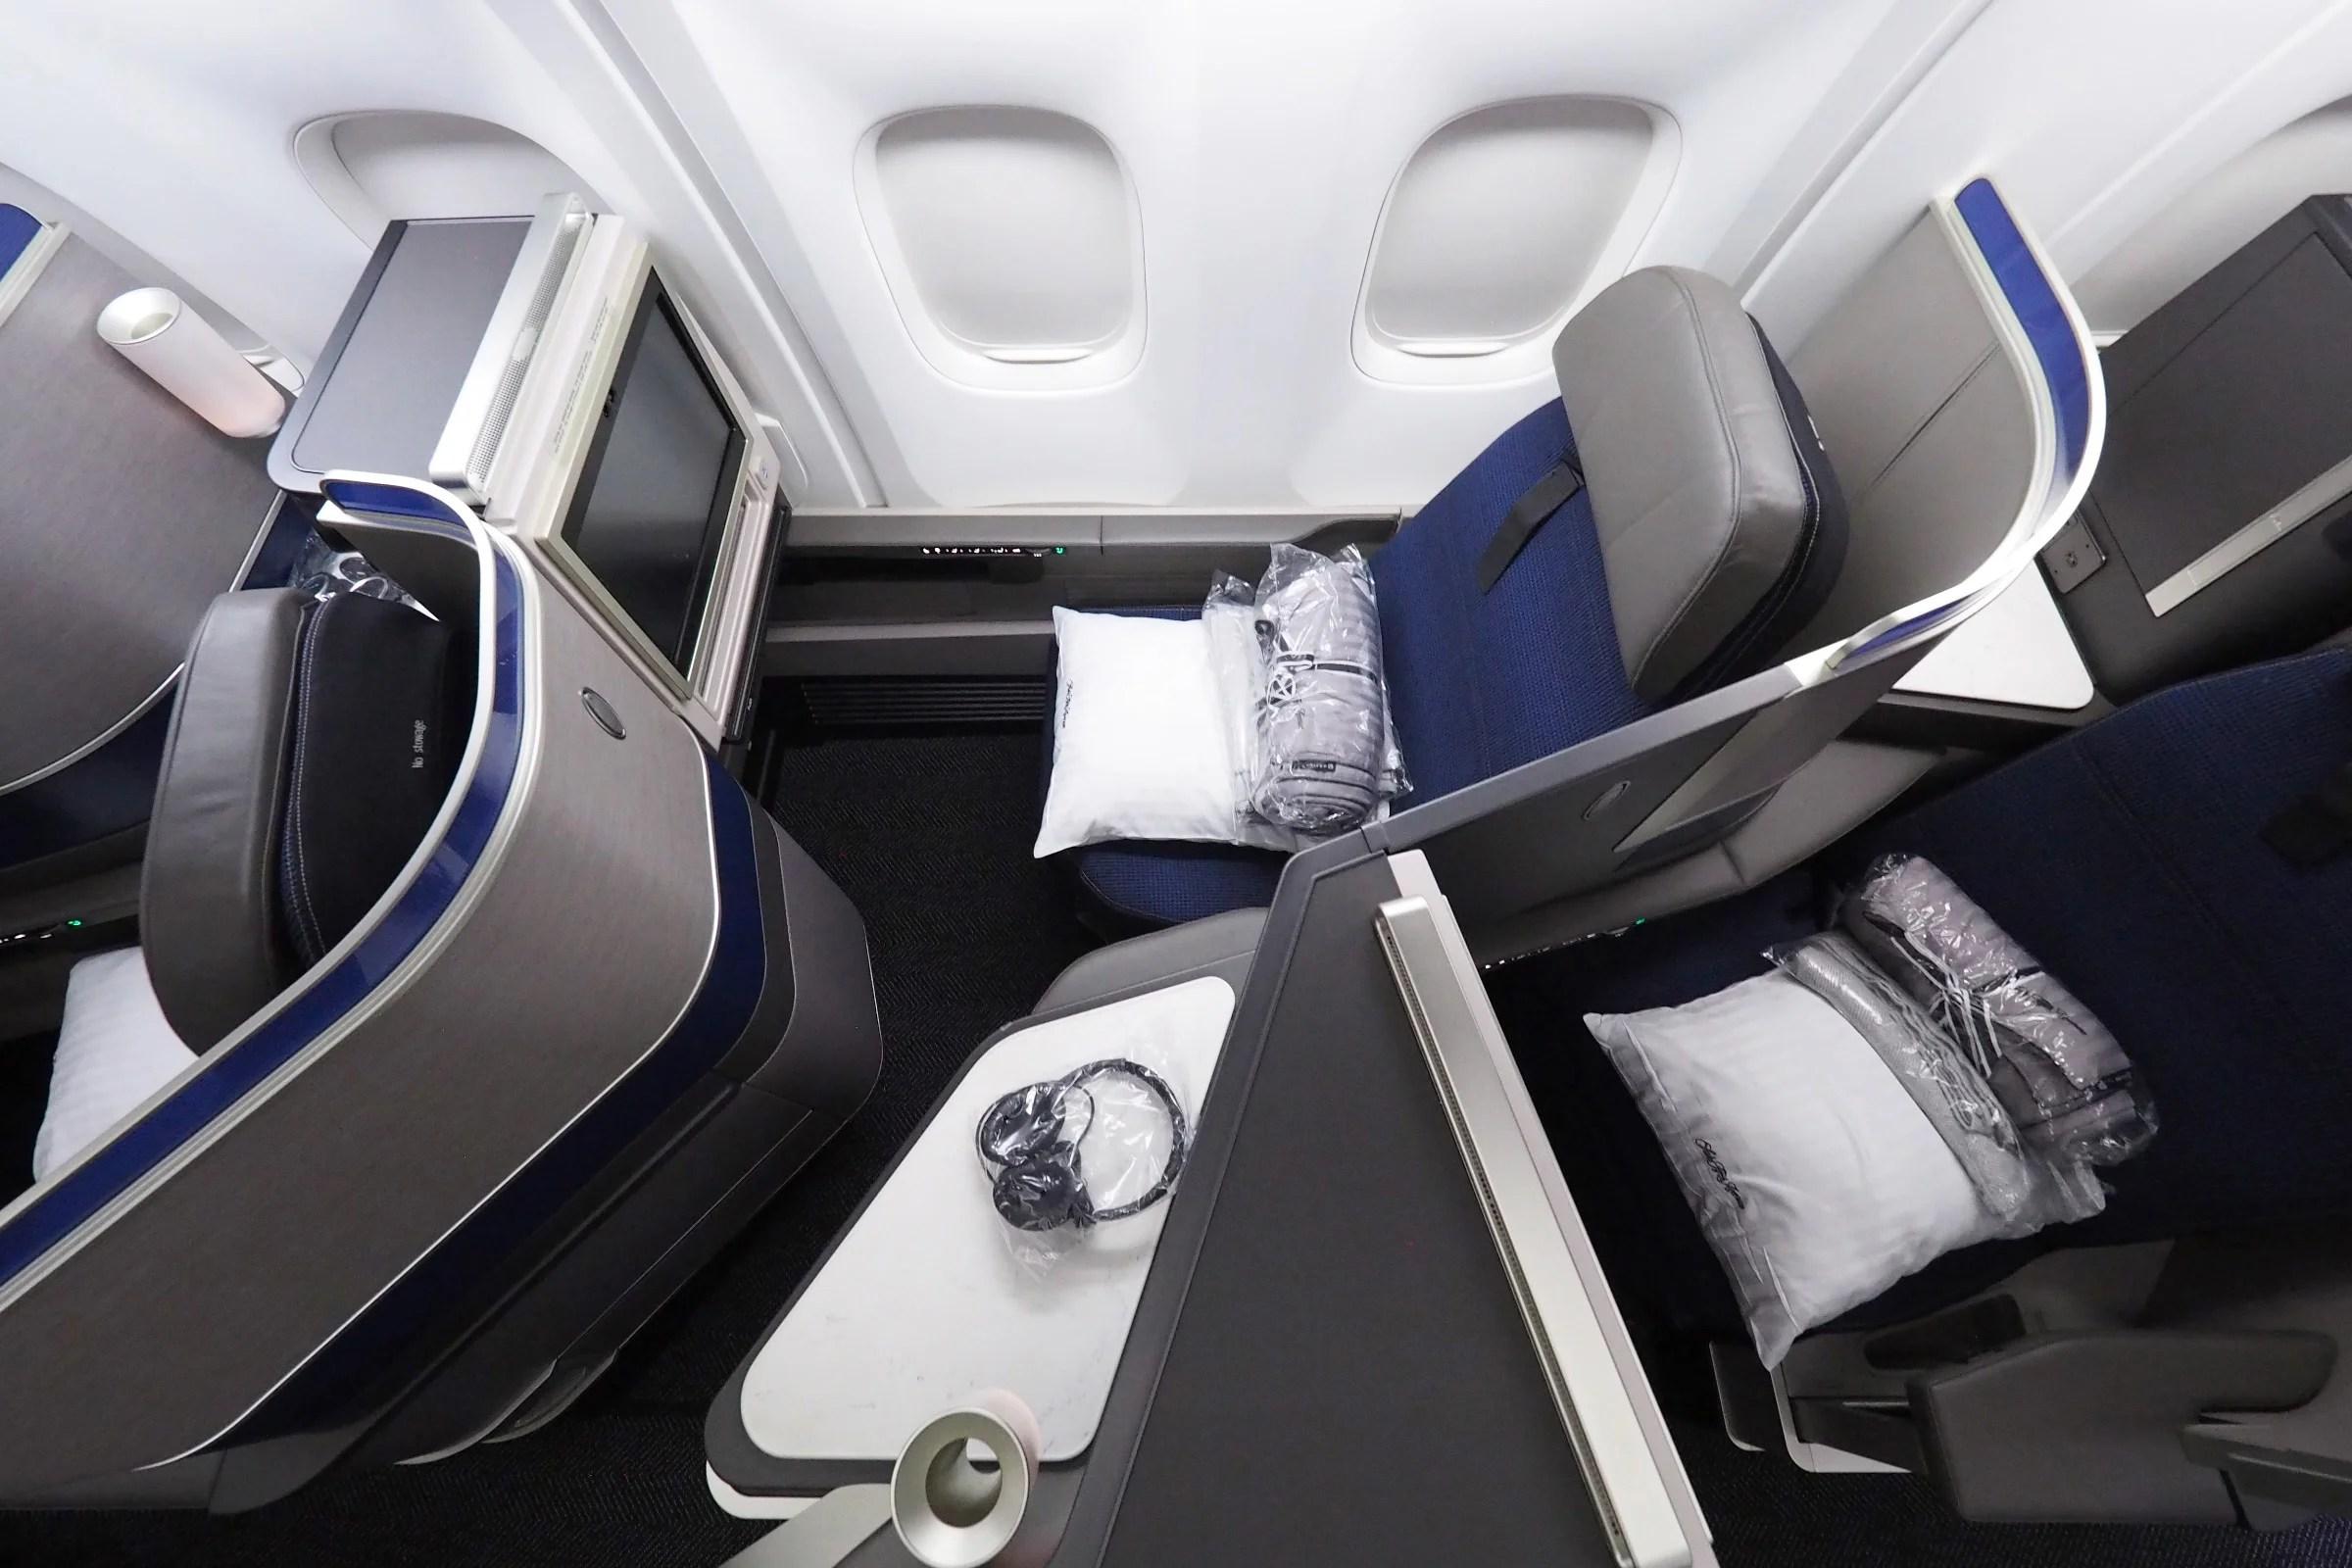 Flight Review: United (767-300ER) Polaris Business Class